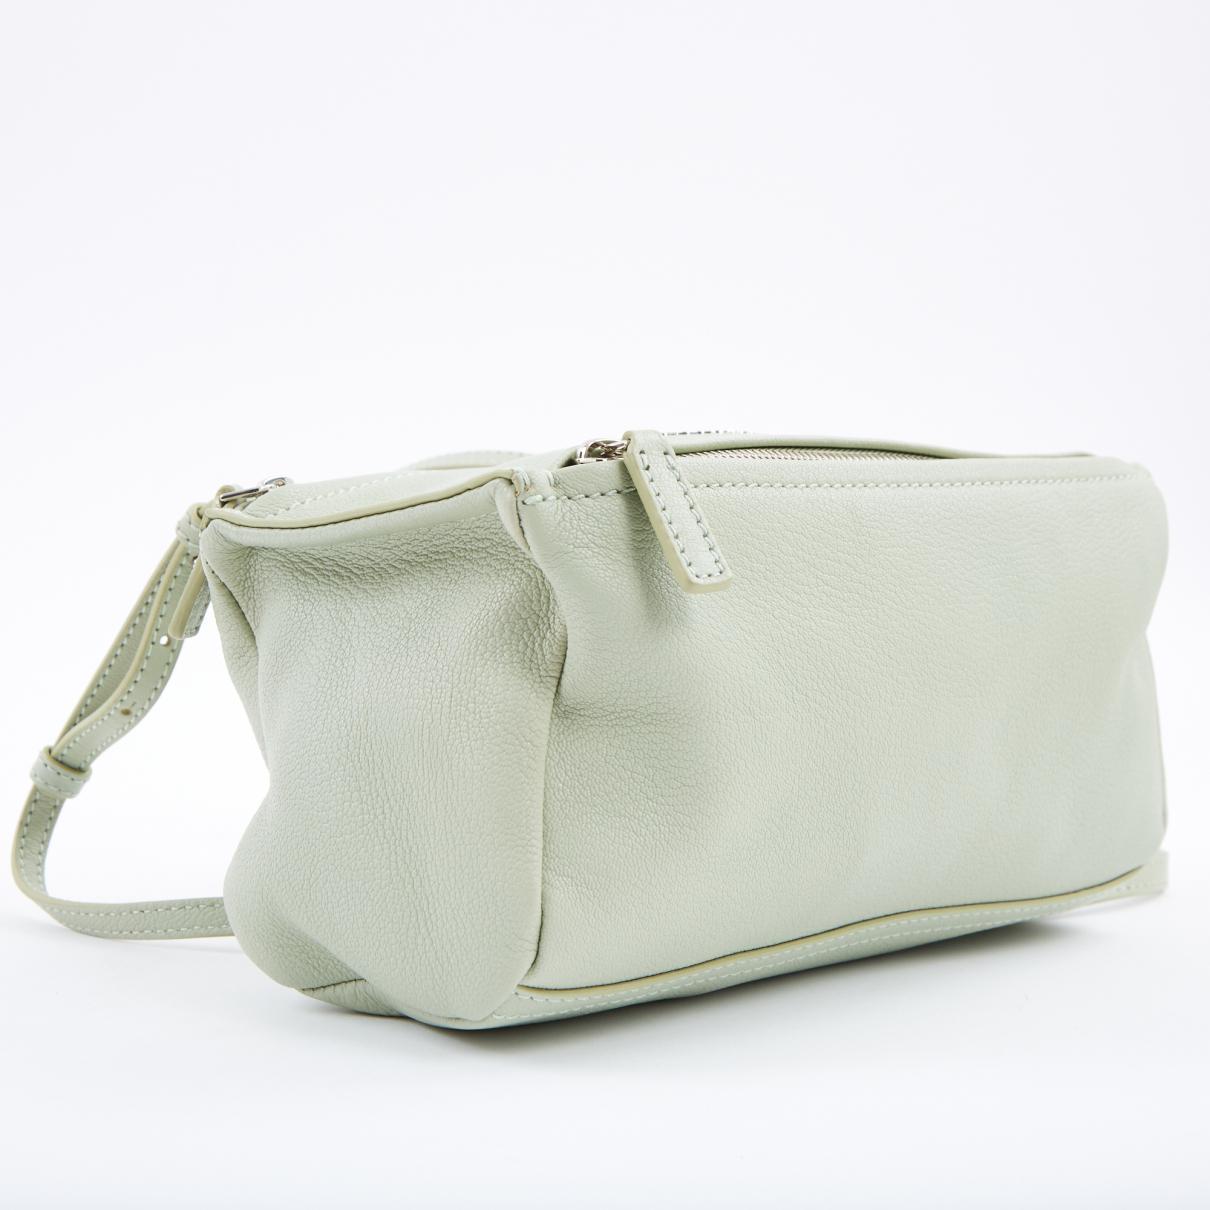 ca98e3c292 Givenchy - Pandora Box Green Leather Handbag - Lyst. View fullscreen